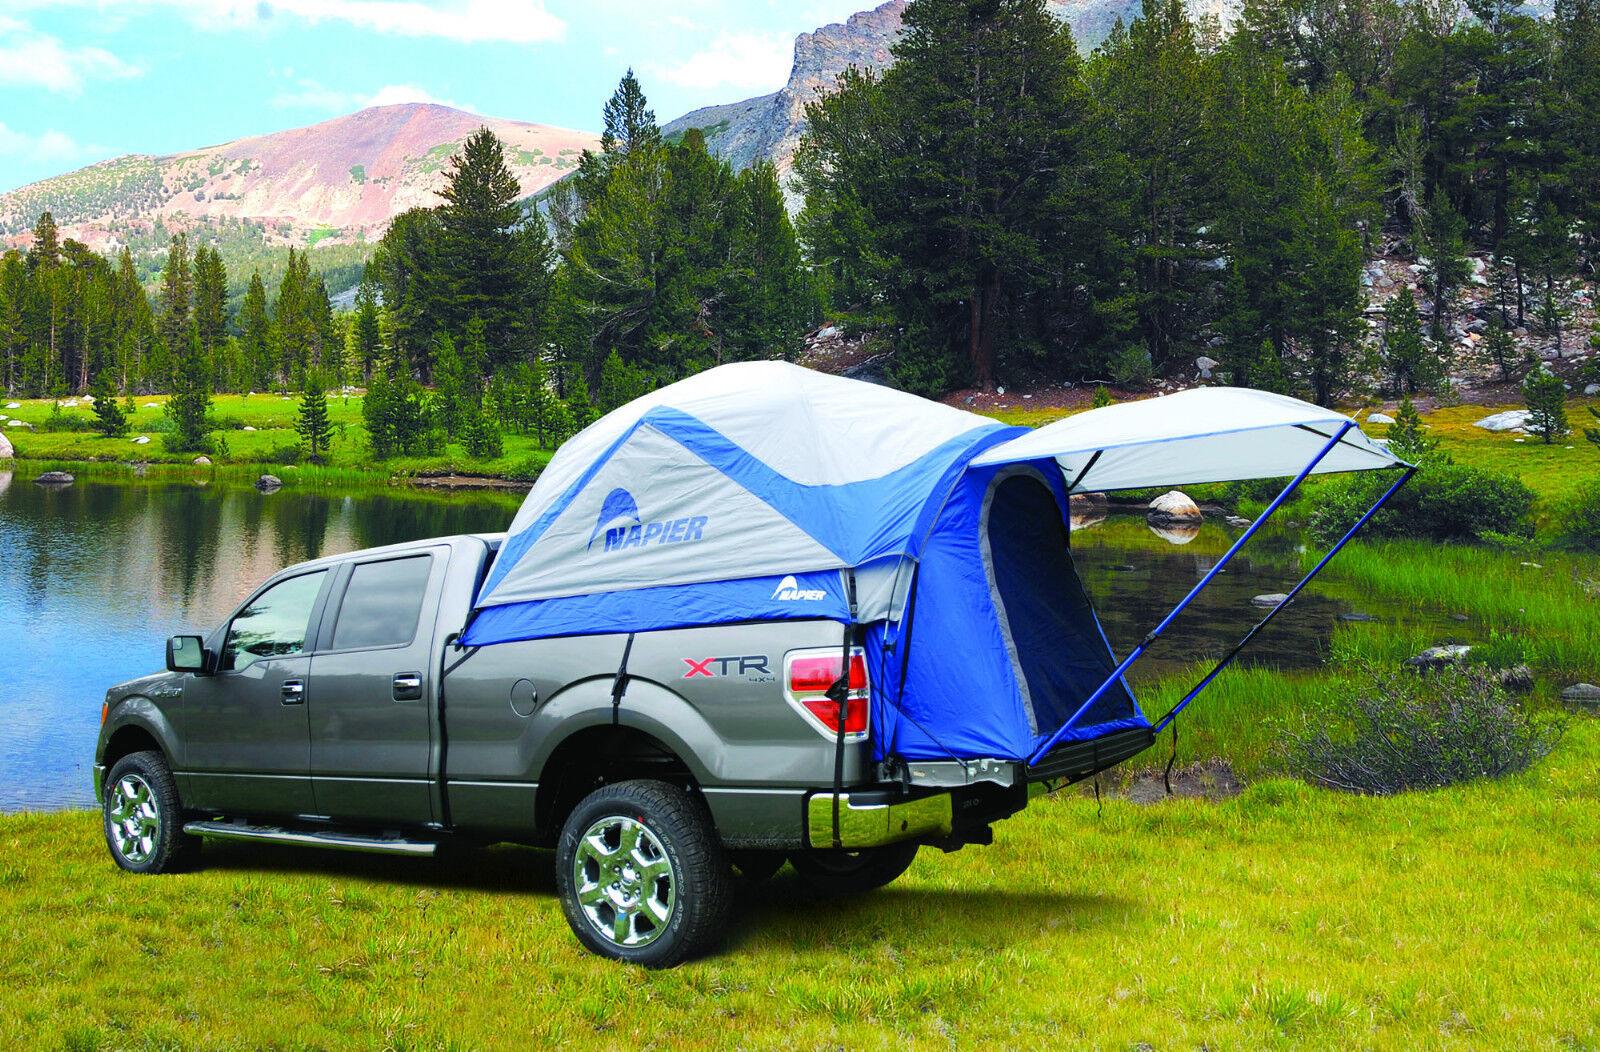 Napier Sportz Truck Tent for Toyota Tacoma 5 Foot Compact Bed C&ing 57066 4 4 of 12 ... & NAPIER SPORTZ TRUCK Tent for Toyota Tacoma 5 Foot Compact Bed ...